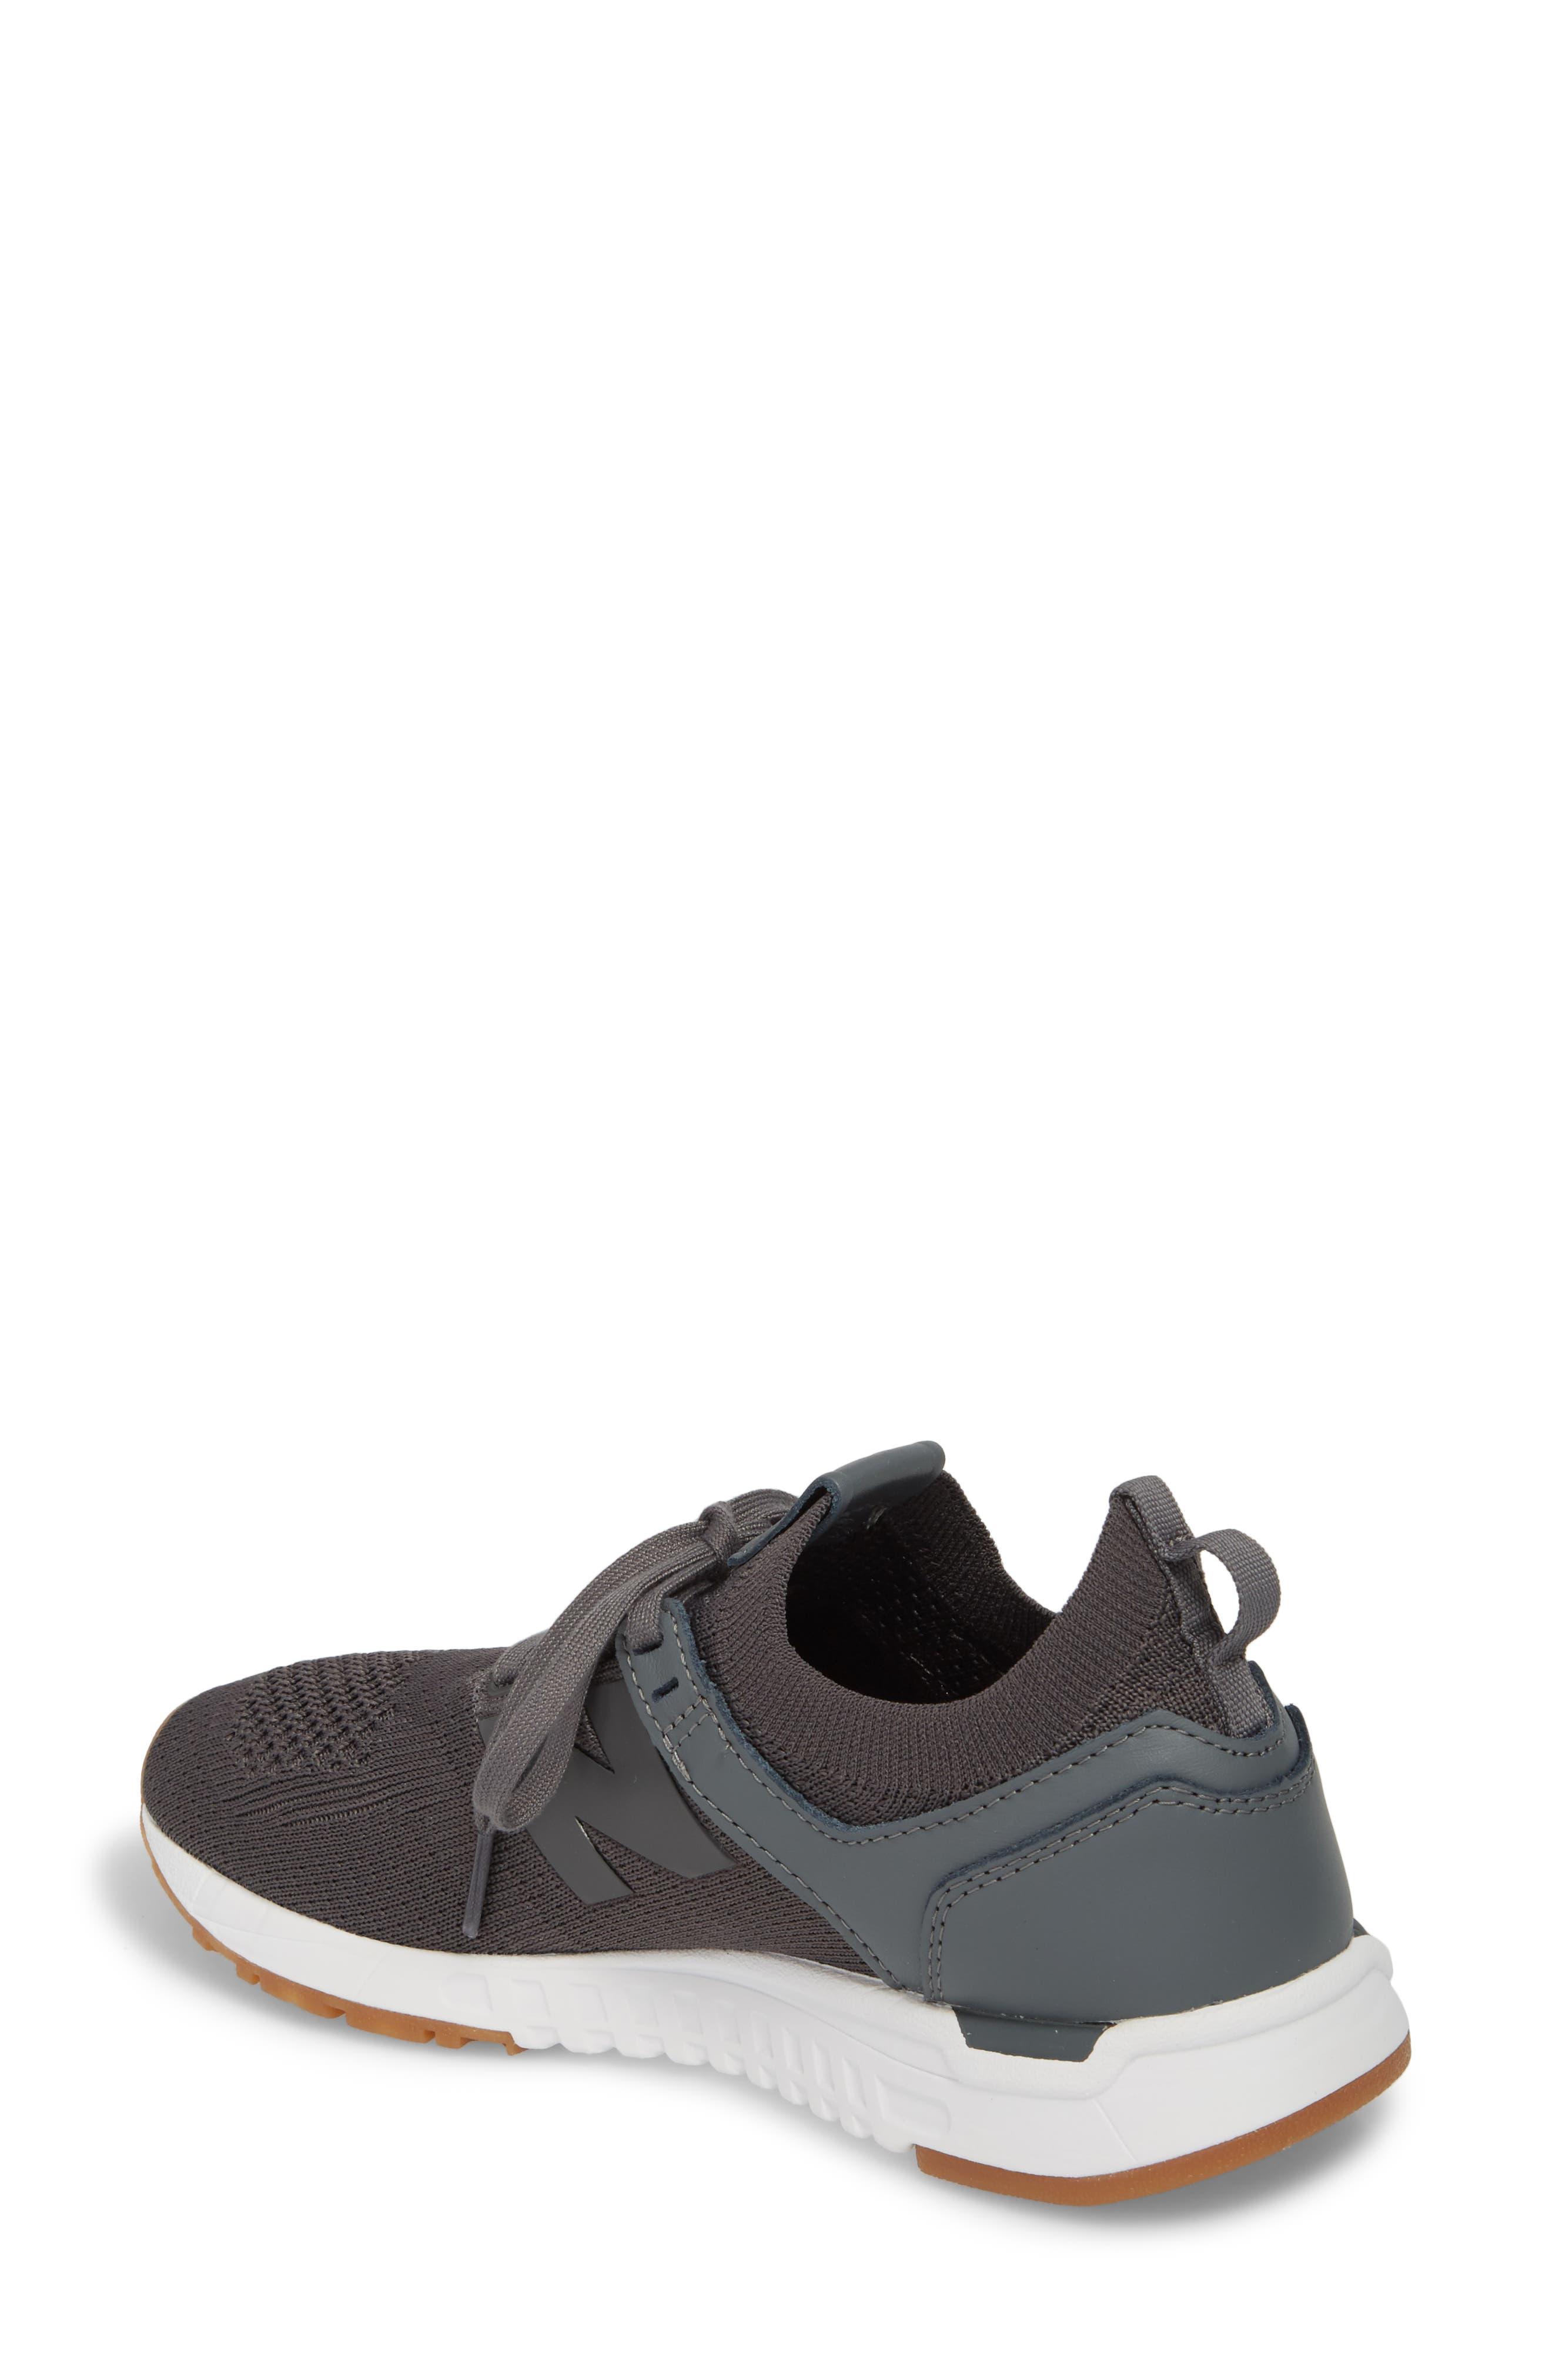 247 Decon Knit Sneaker,                             Alternate thumbnail 2, color,                             030